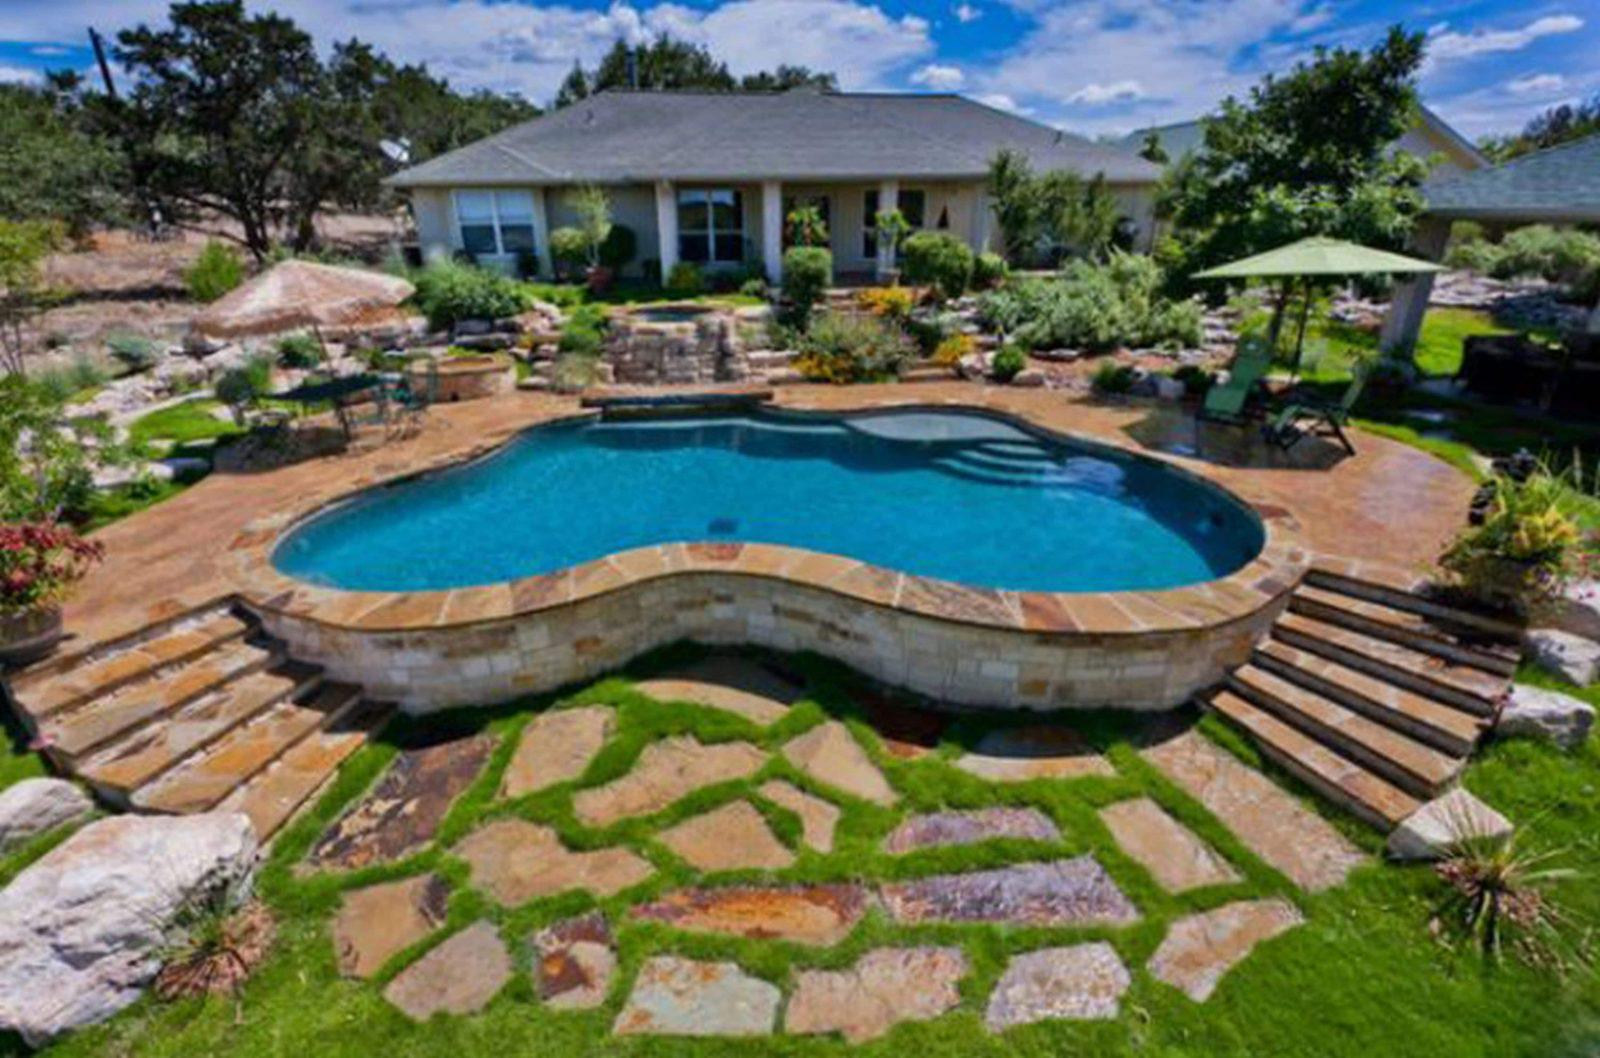 20 Amazing Backyard Pool Designs - YardMasterz.com on Nice Backyard Landscaping Ideas id=16024